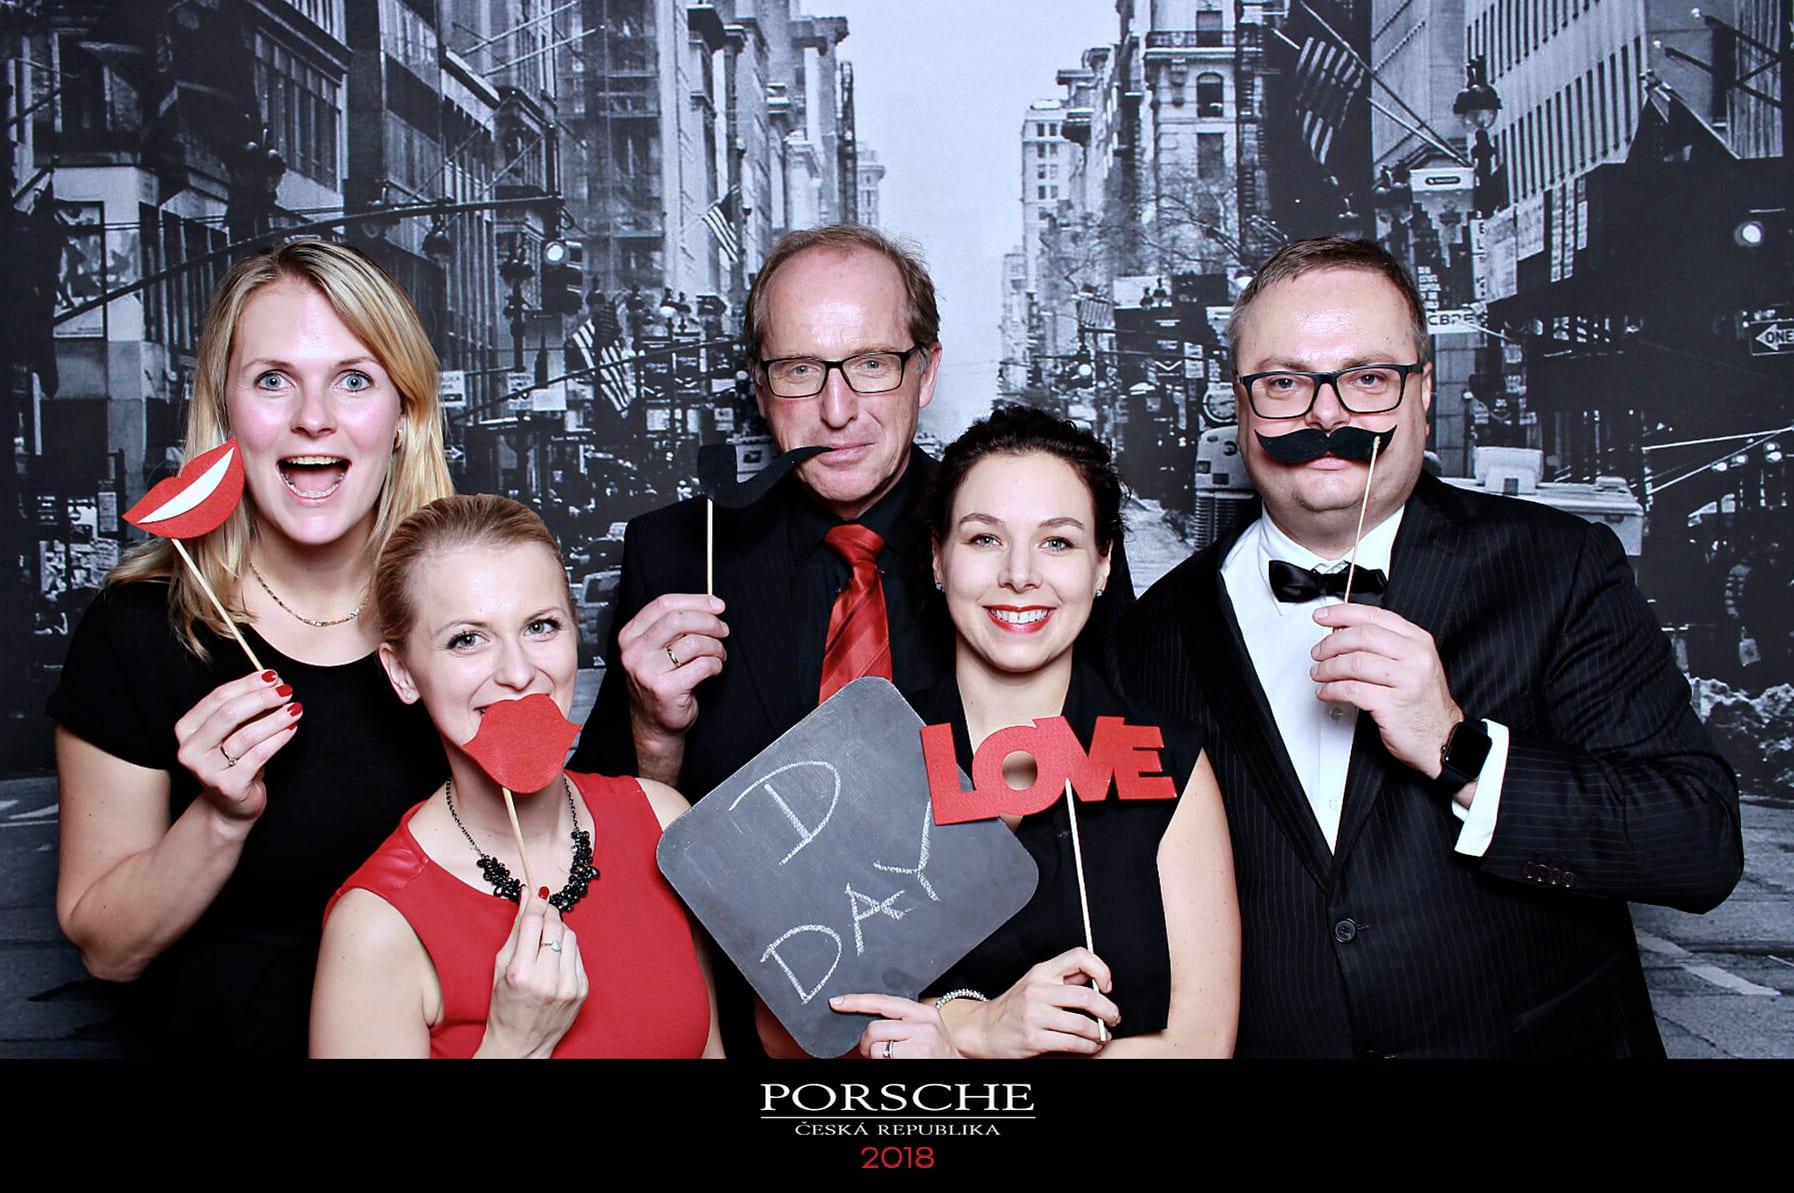 fotokoutek-porsche-18-12-2018-555051